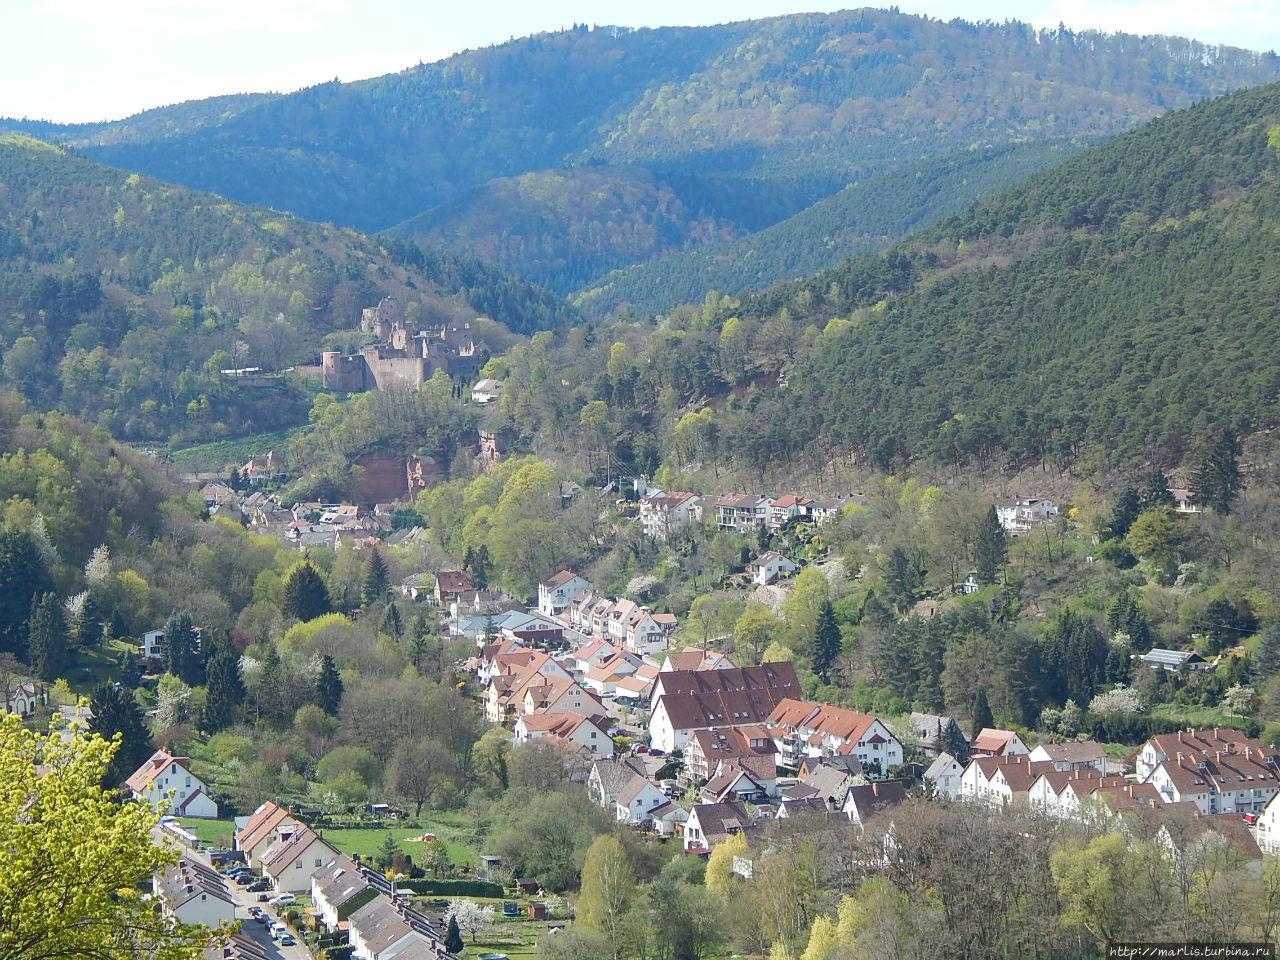 Вид на Харденбург из монастыря Лимбург